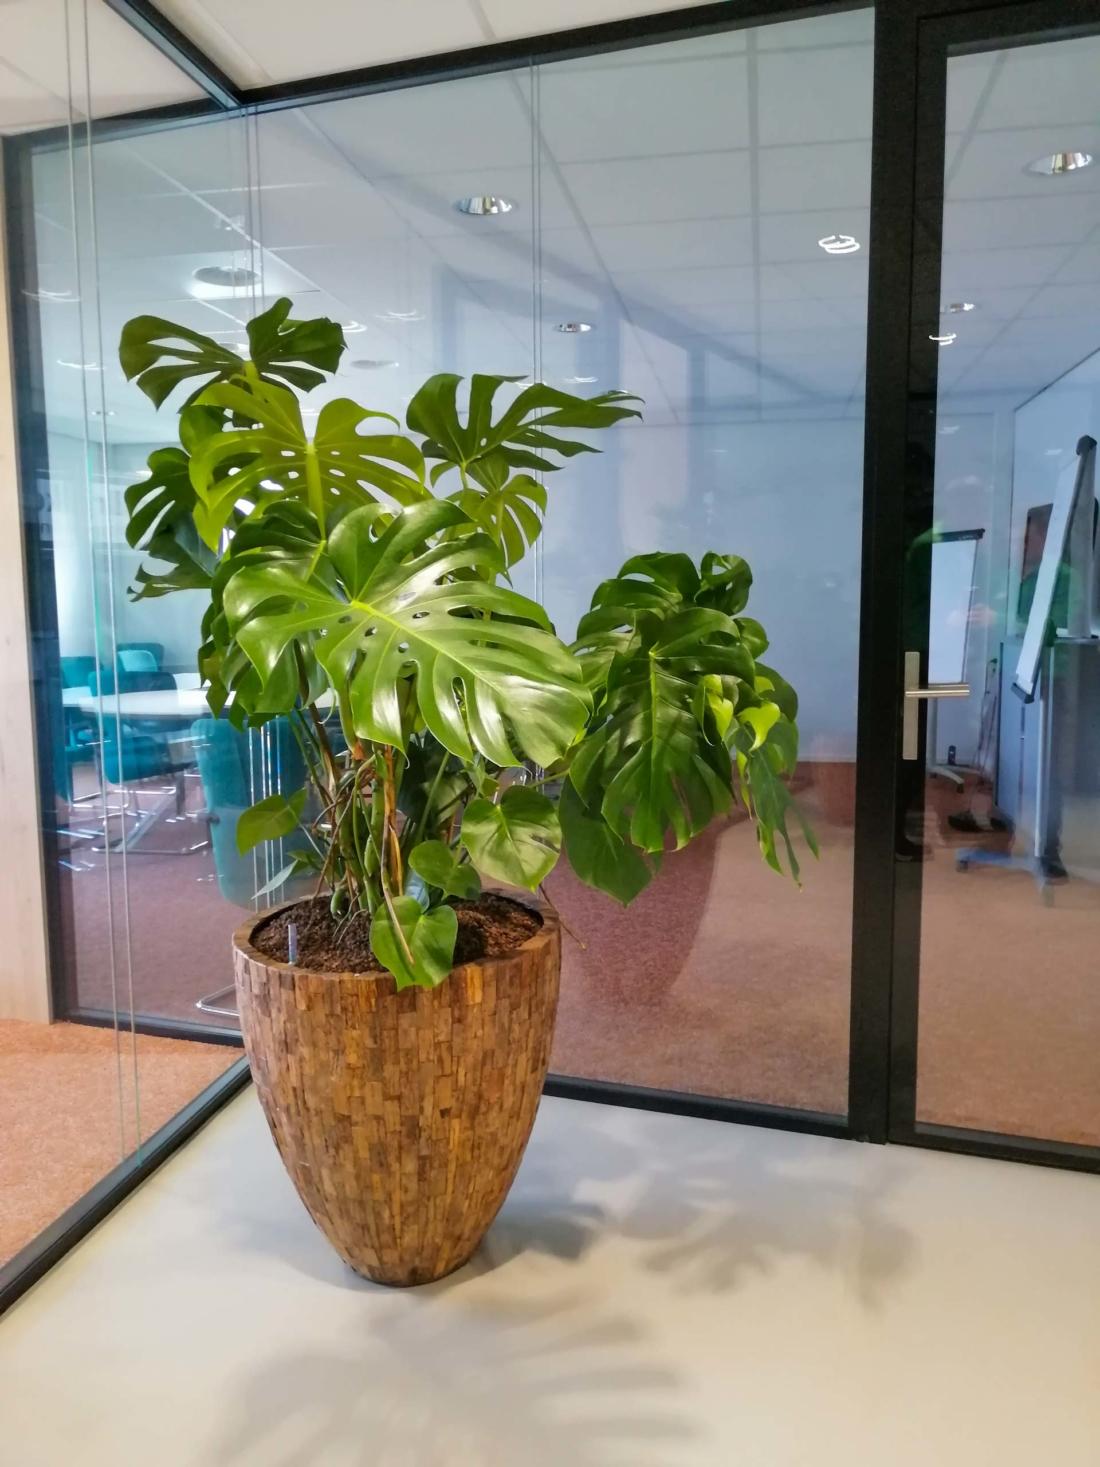 Cemani-wood-plantenbak-met-monstera-plant-1100x1467.jpg